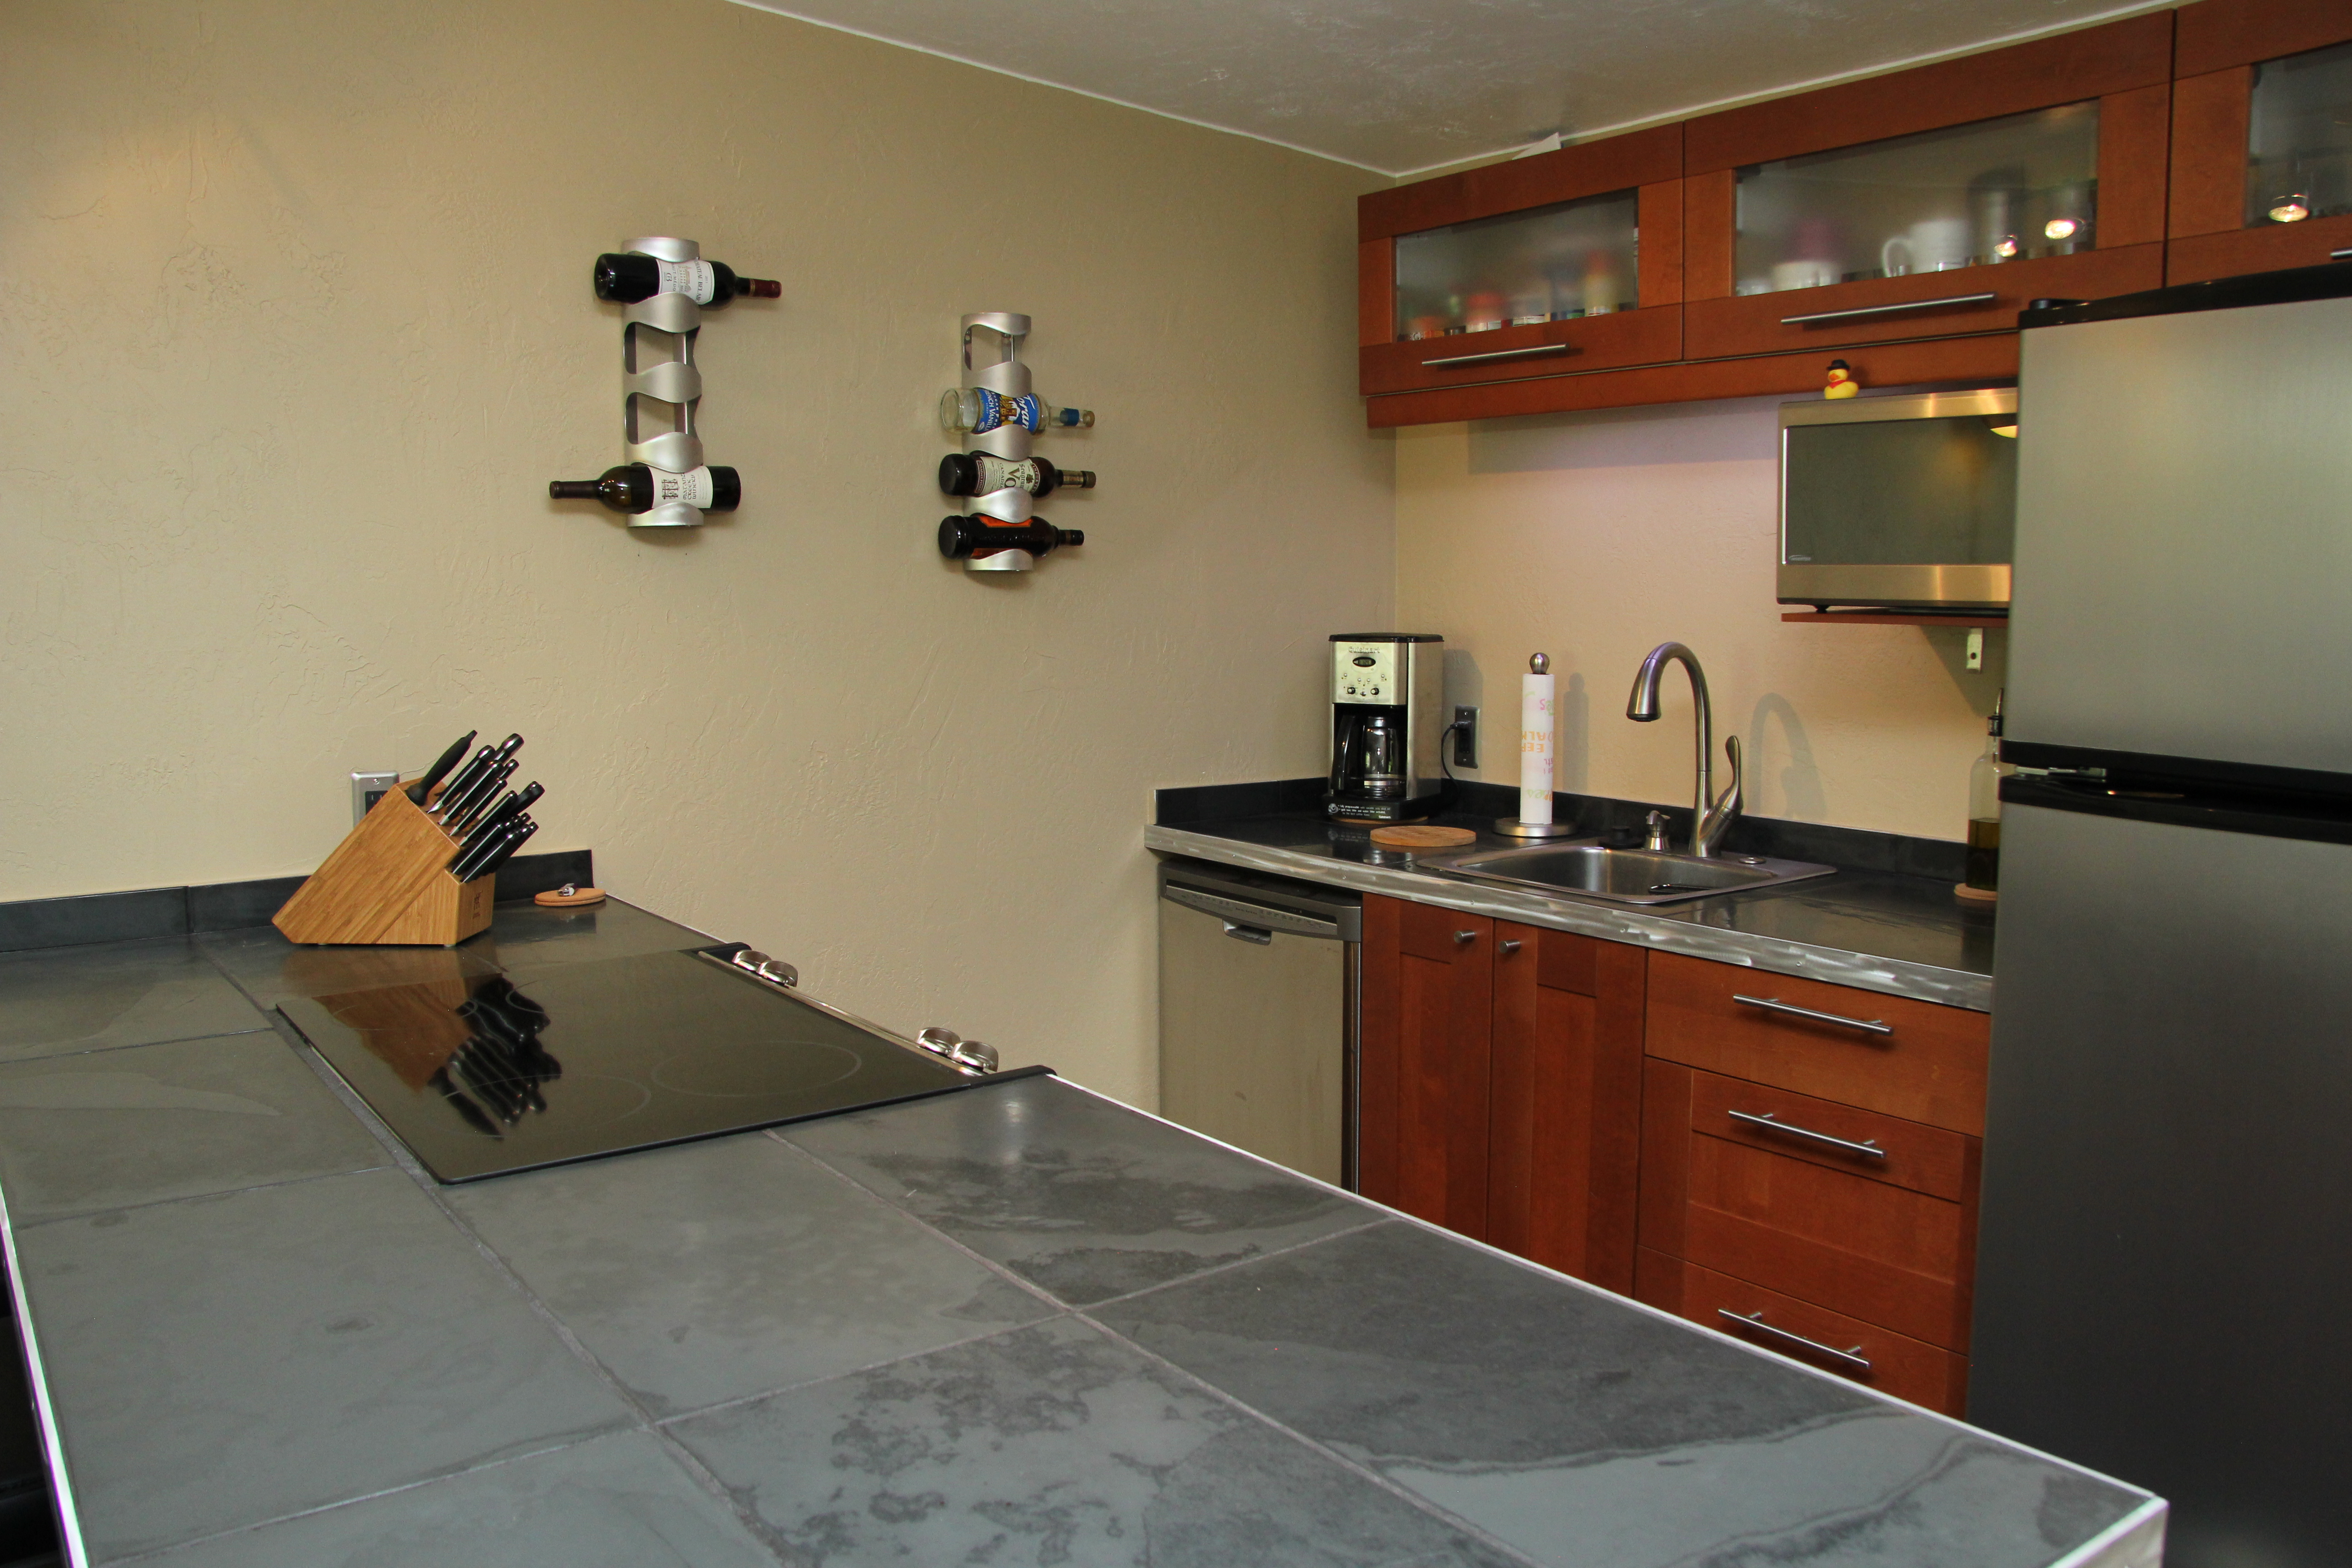 Affordable Warm Springs condo in Ketchum, Idaho